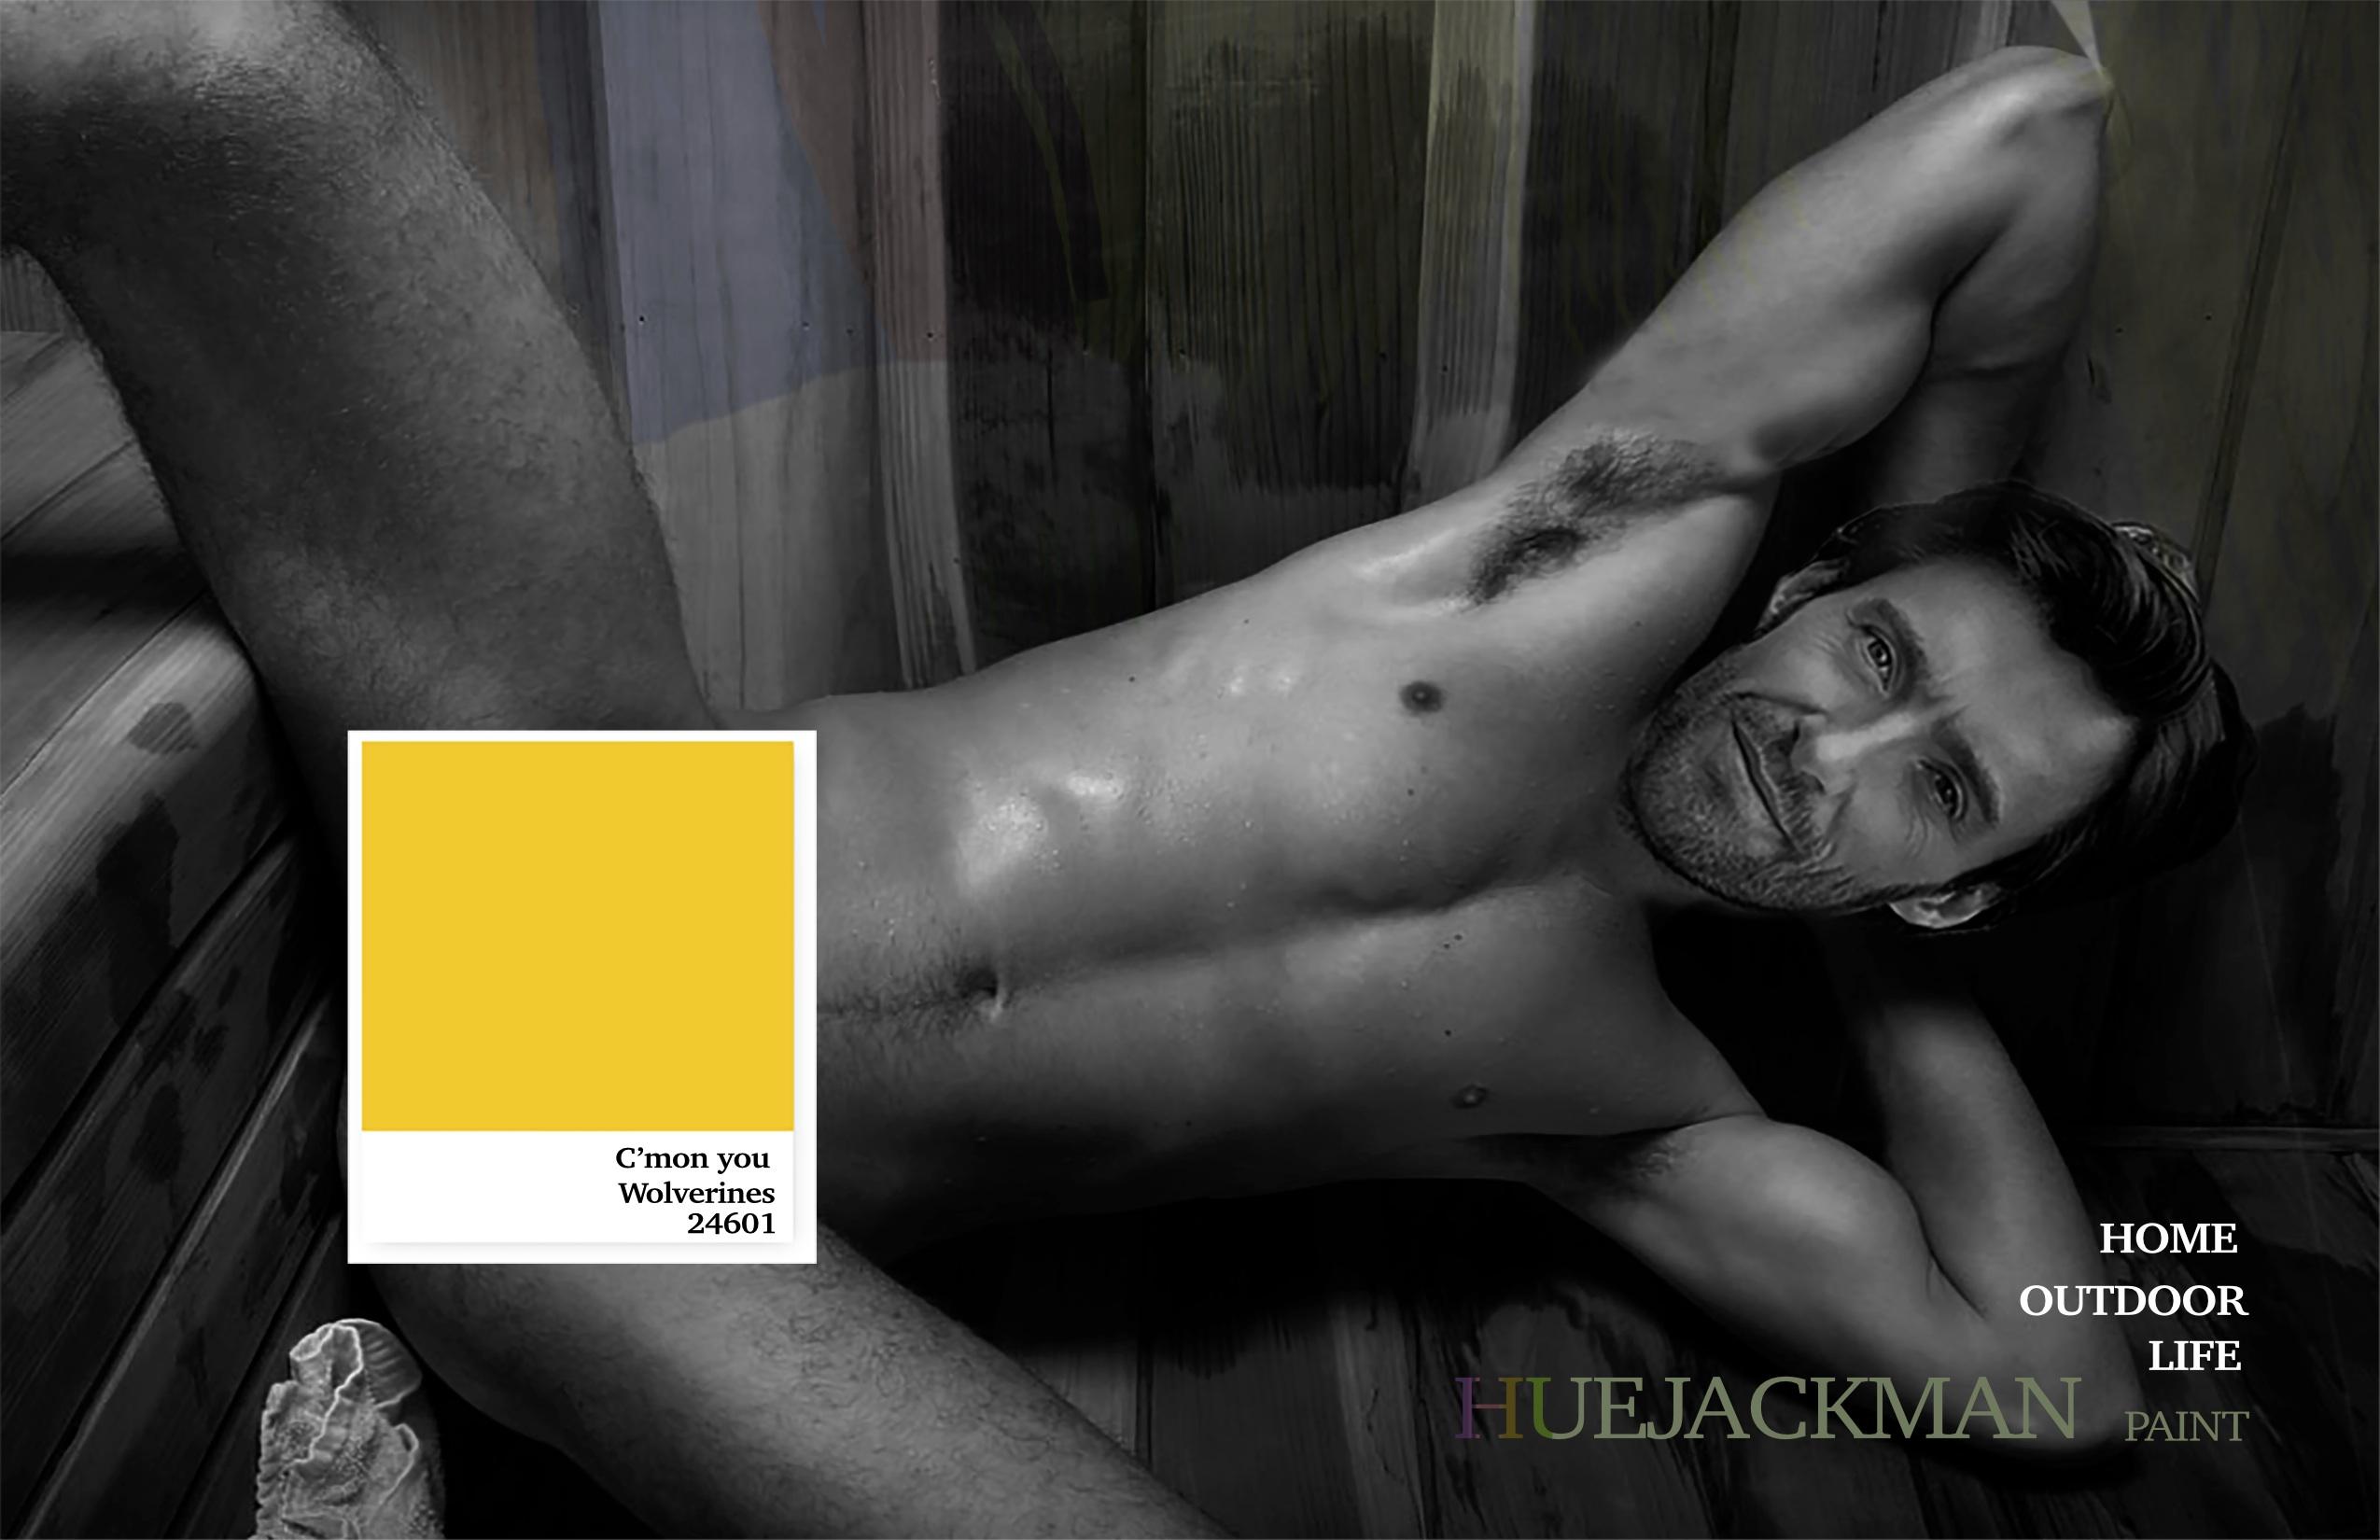 sexy hue jackman add.jpg